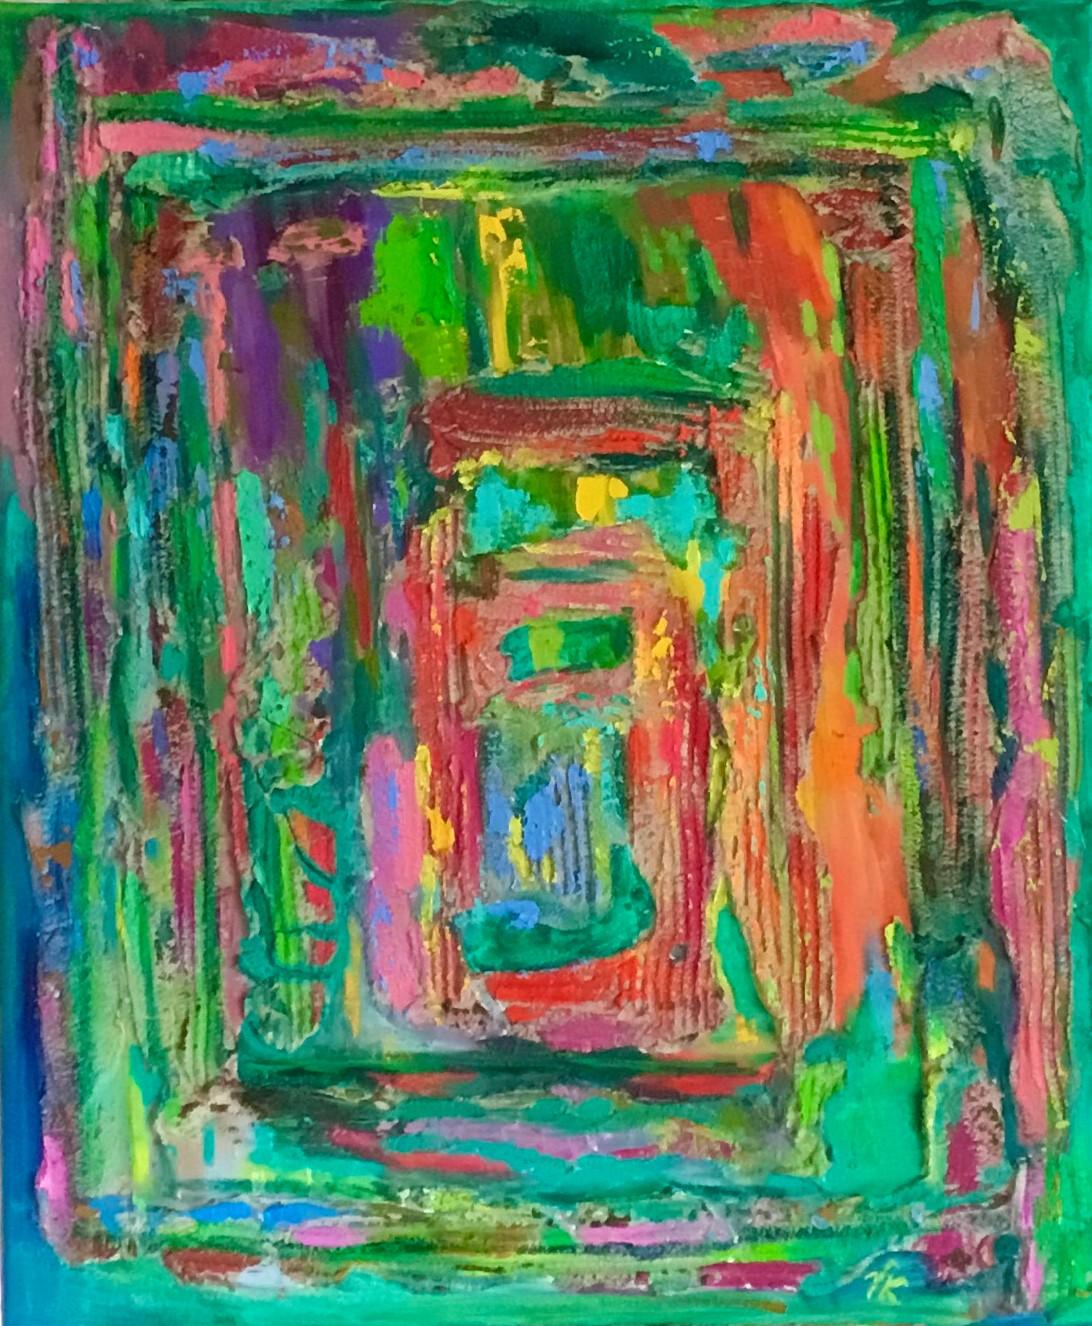 Vera Klimova - Im Labyrinth des Lebens